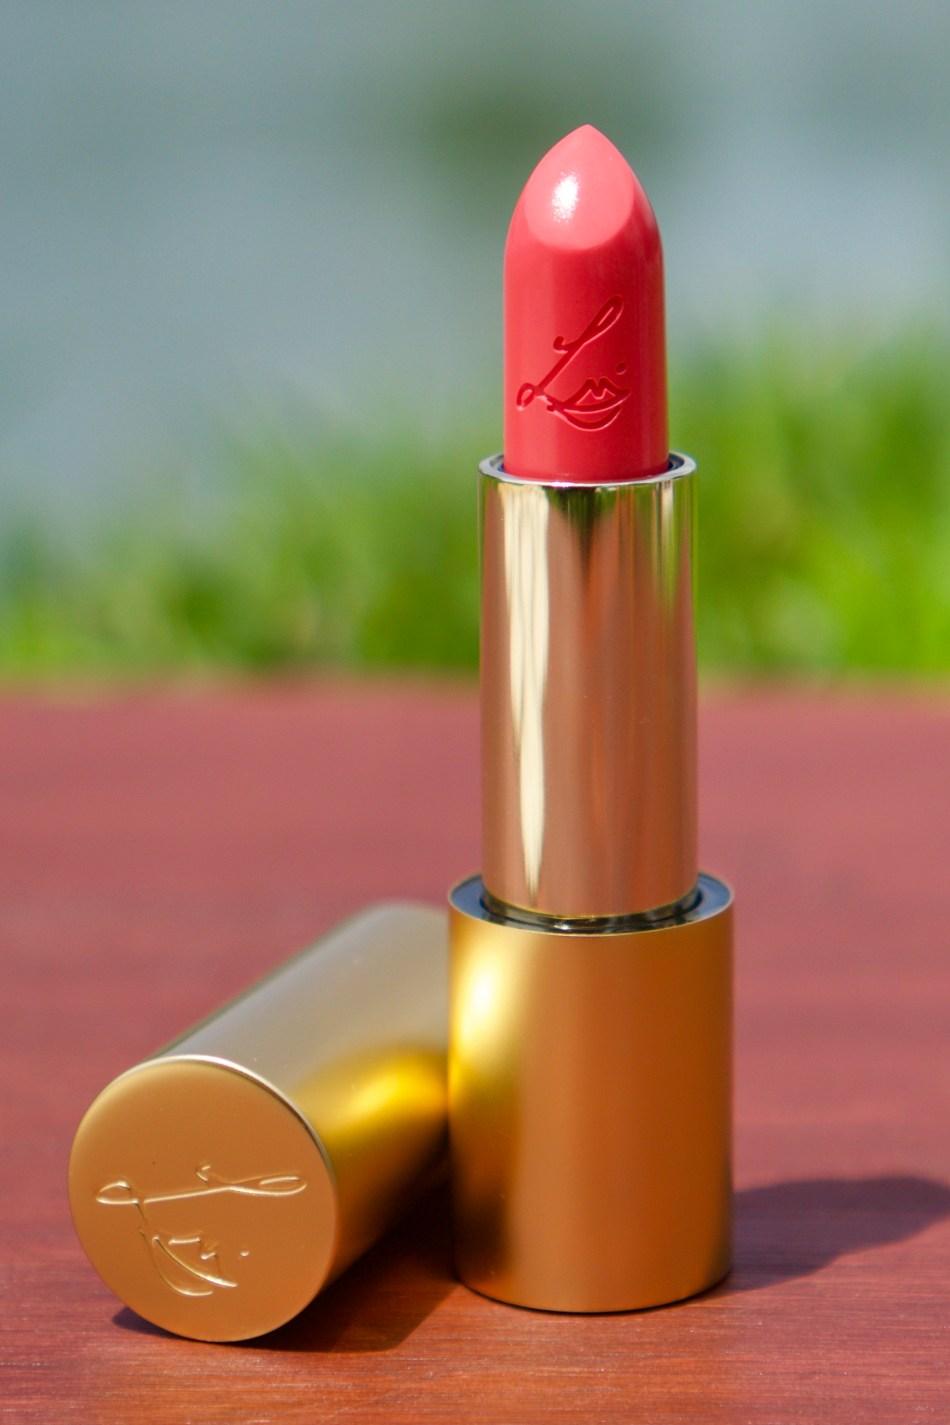 Lisa Eldridge Summer Pink Lipsticks © 2019 ericarobbin.com | All rights reserved.